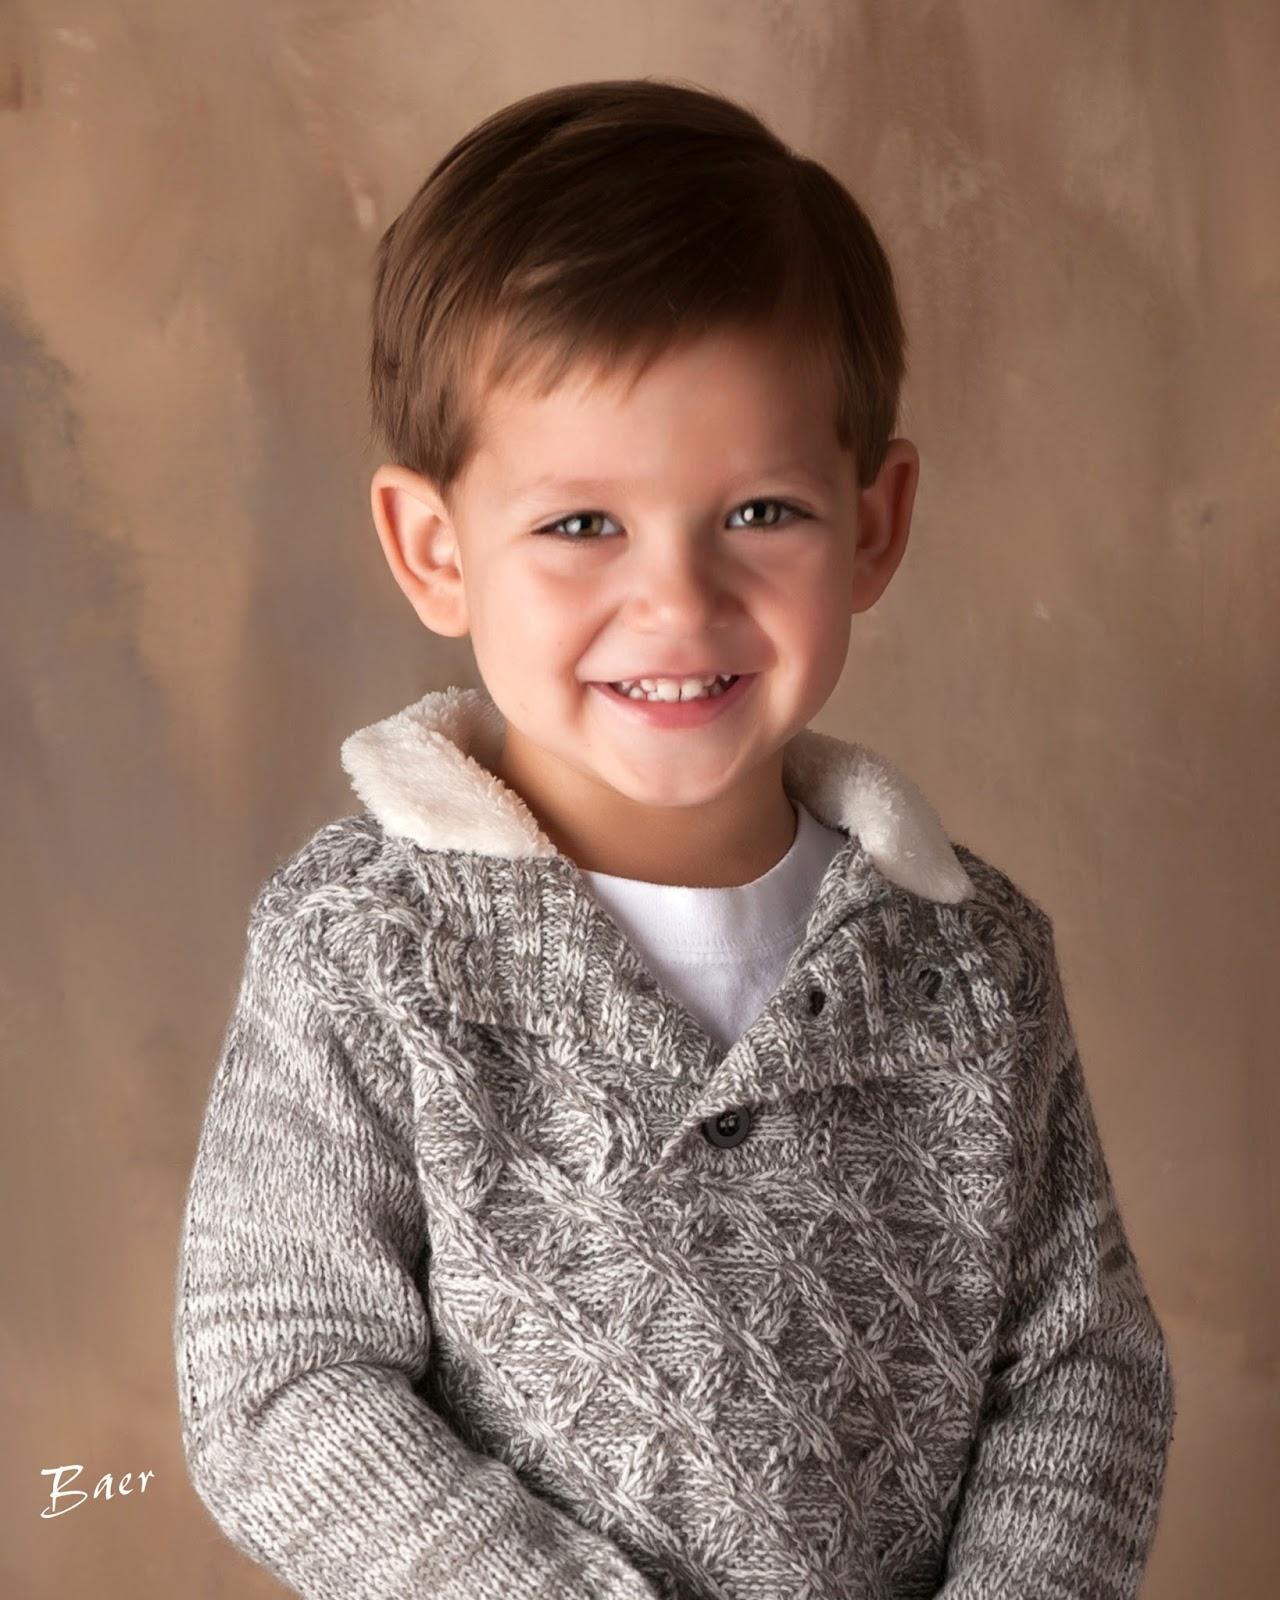 Baer Photography: 2018 Cute Kid Contest